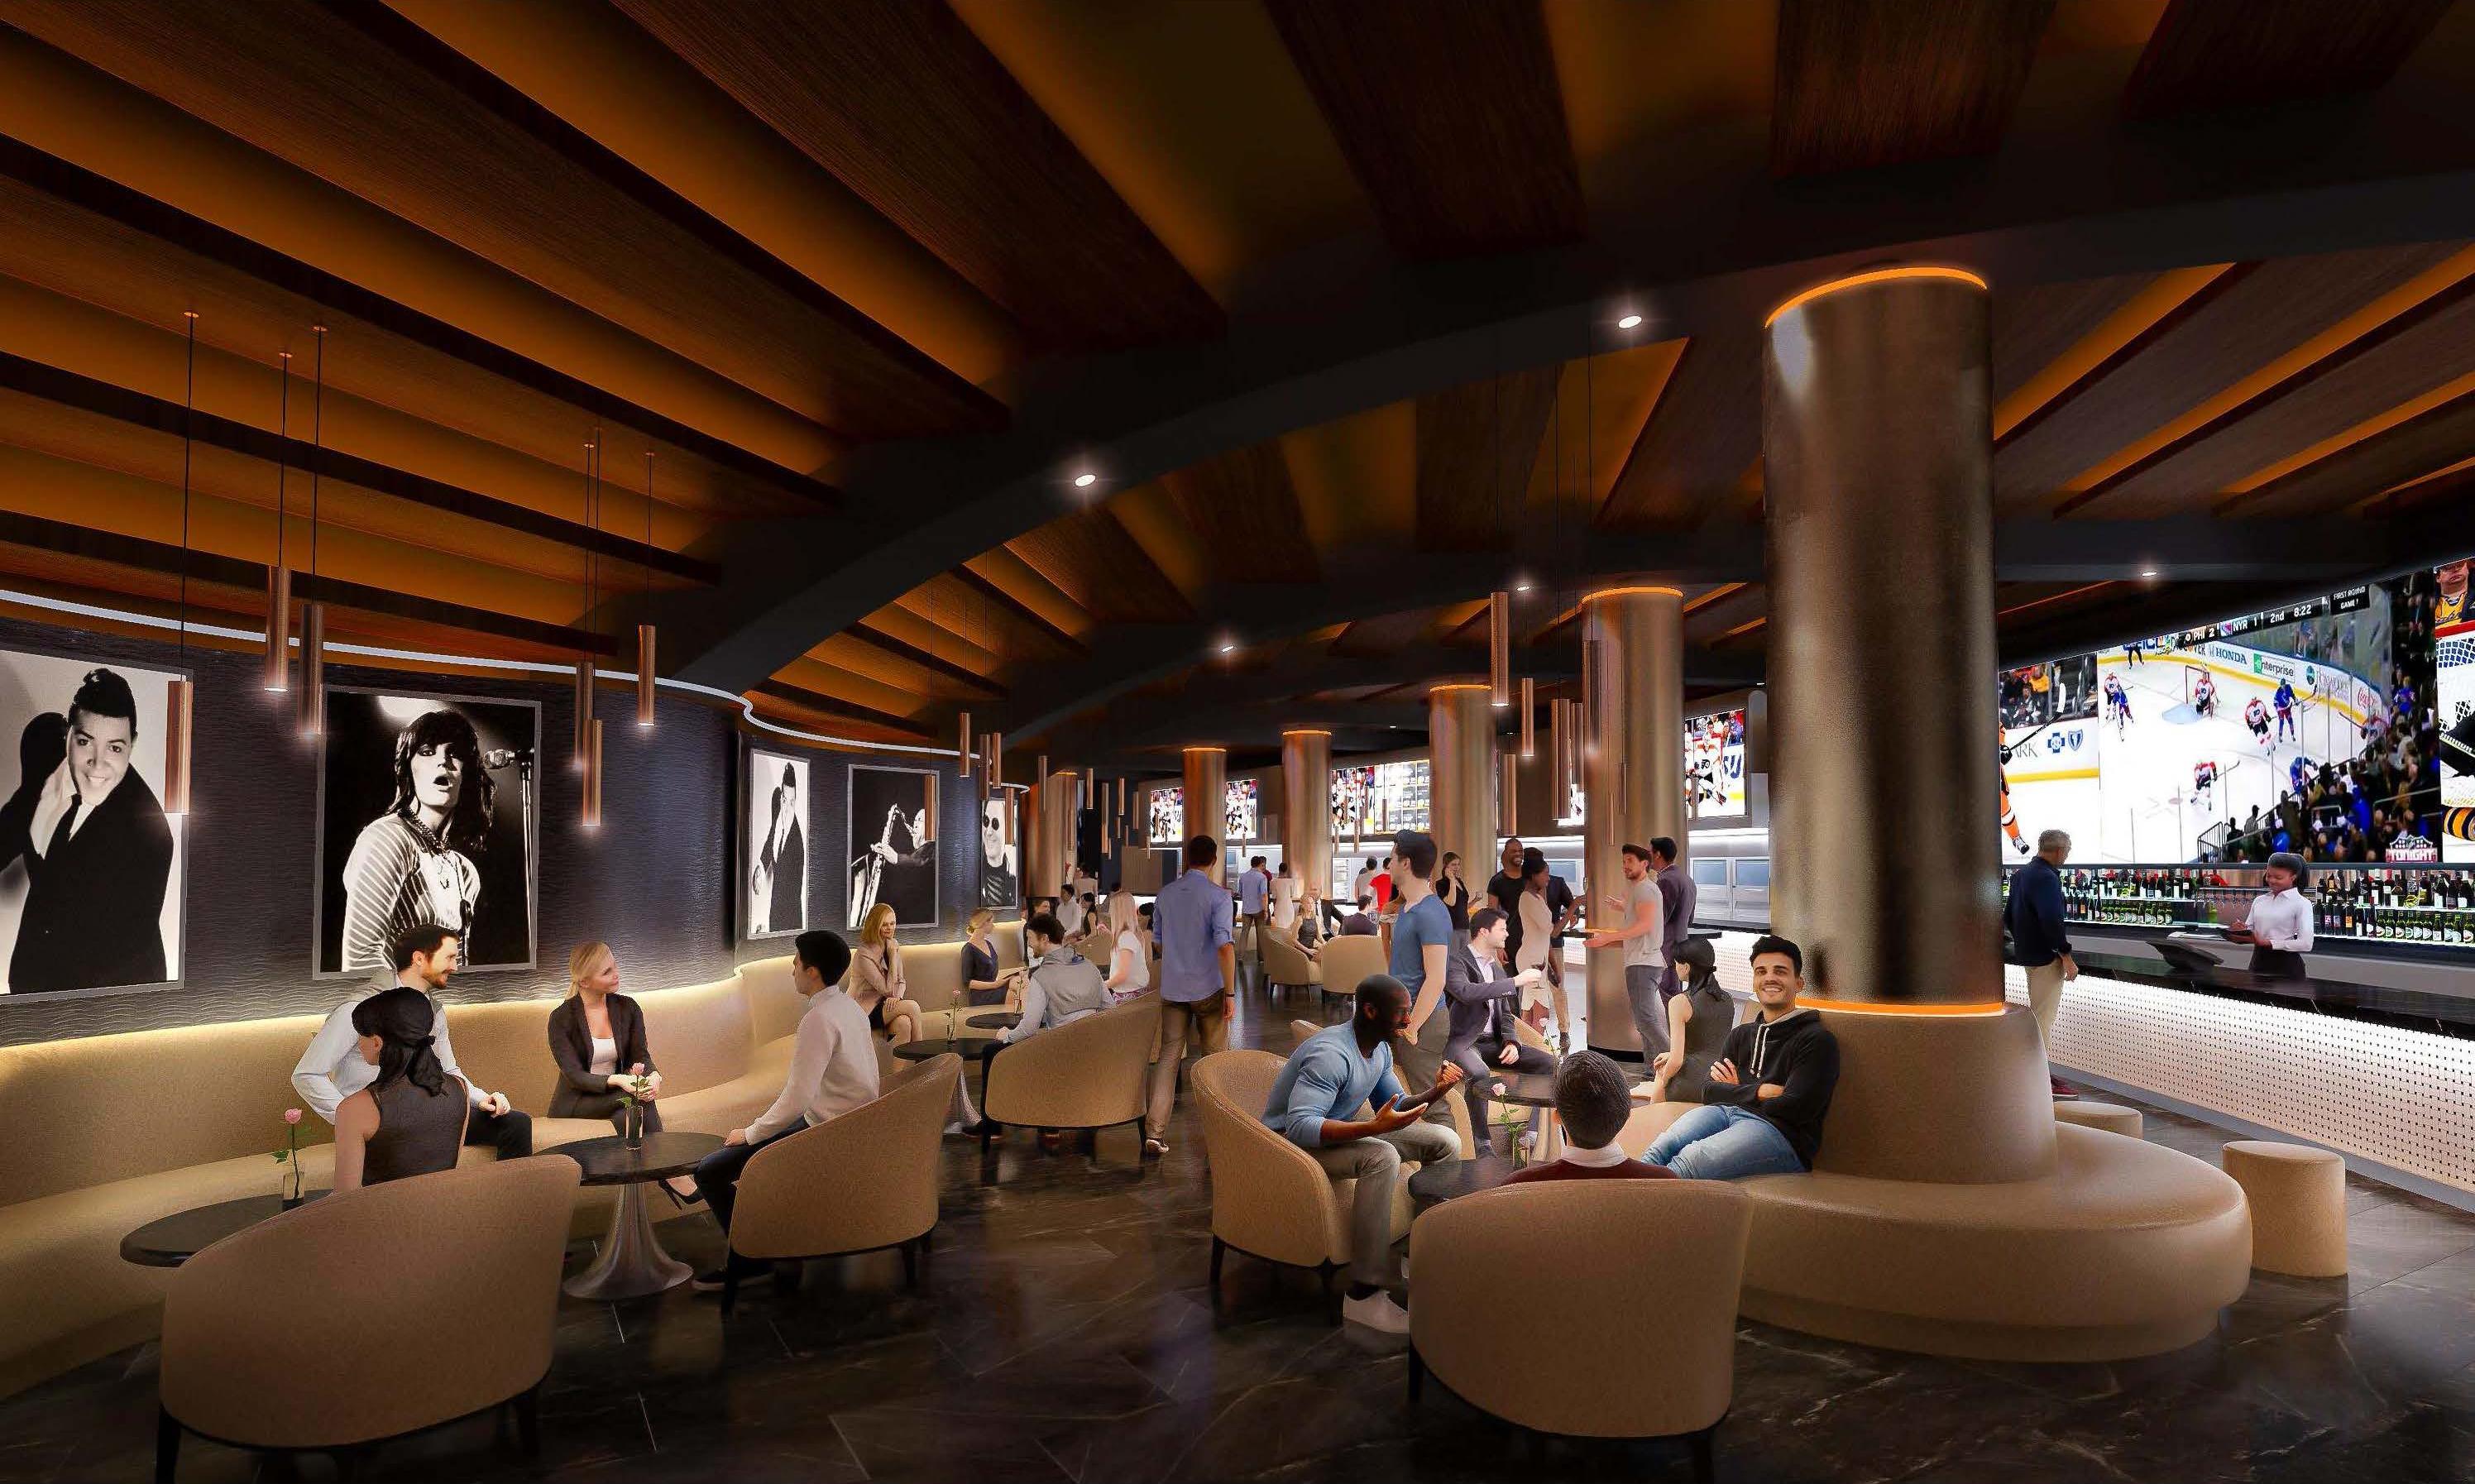 Wells Fargo Center unveils plans for expanded Event-Level